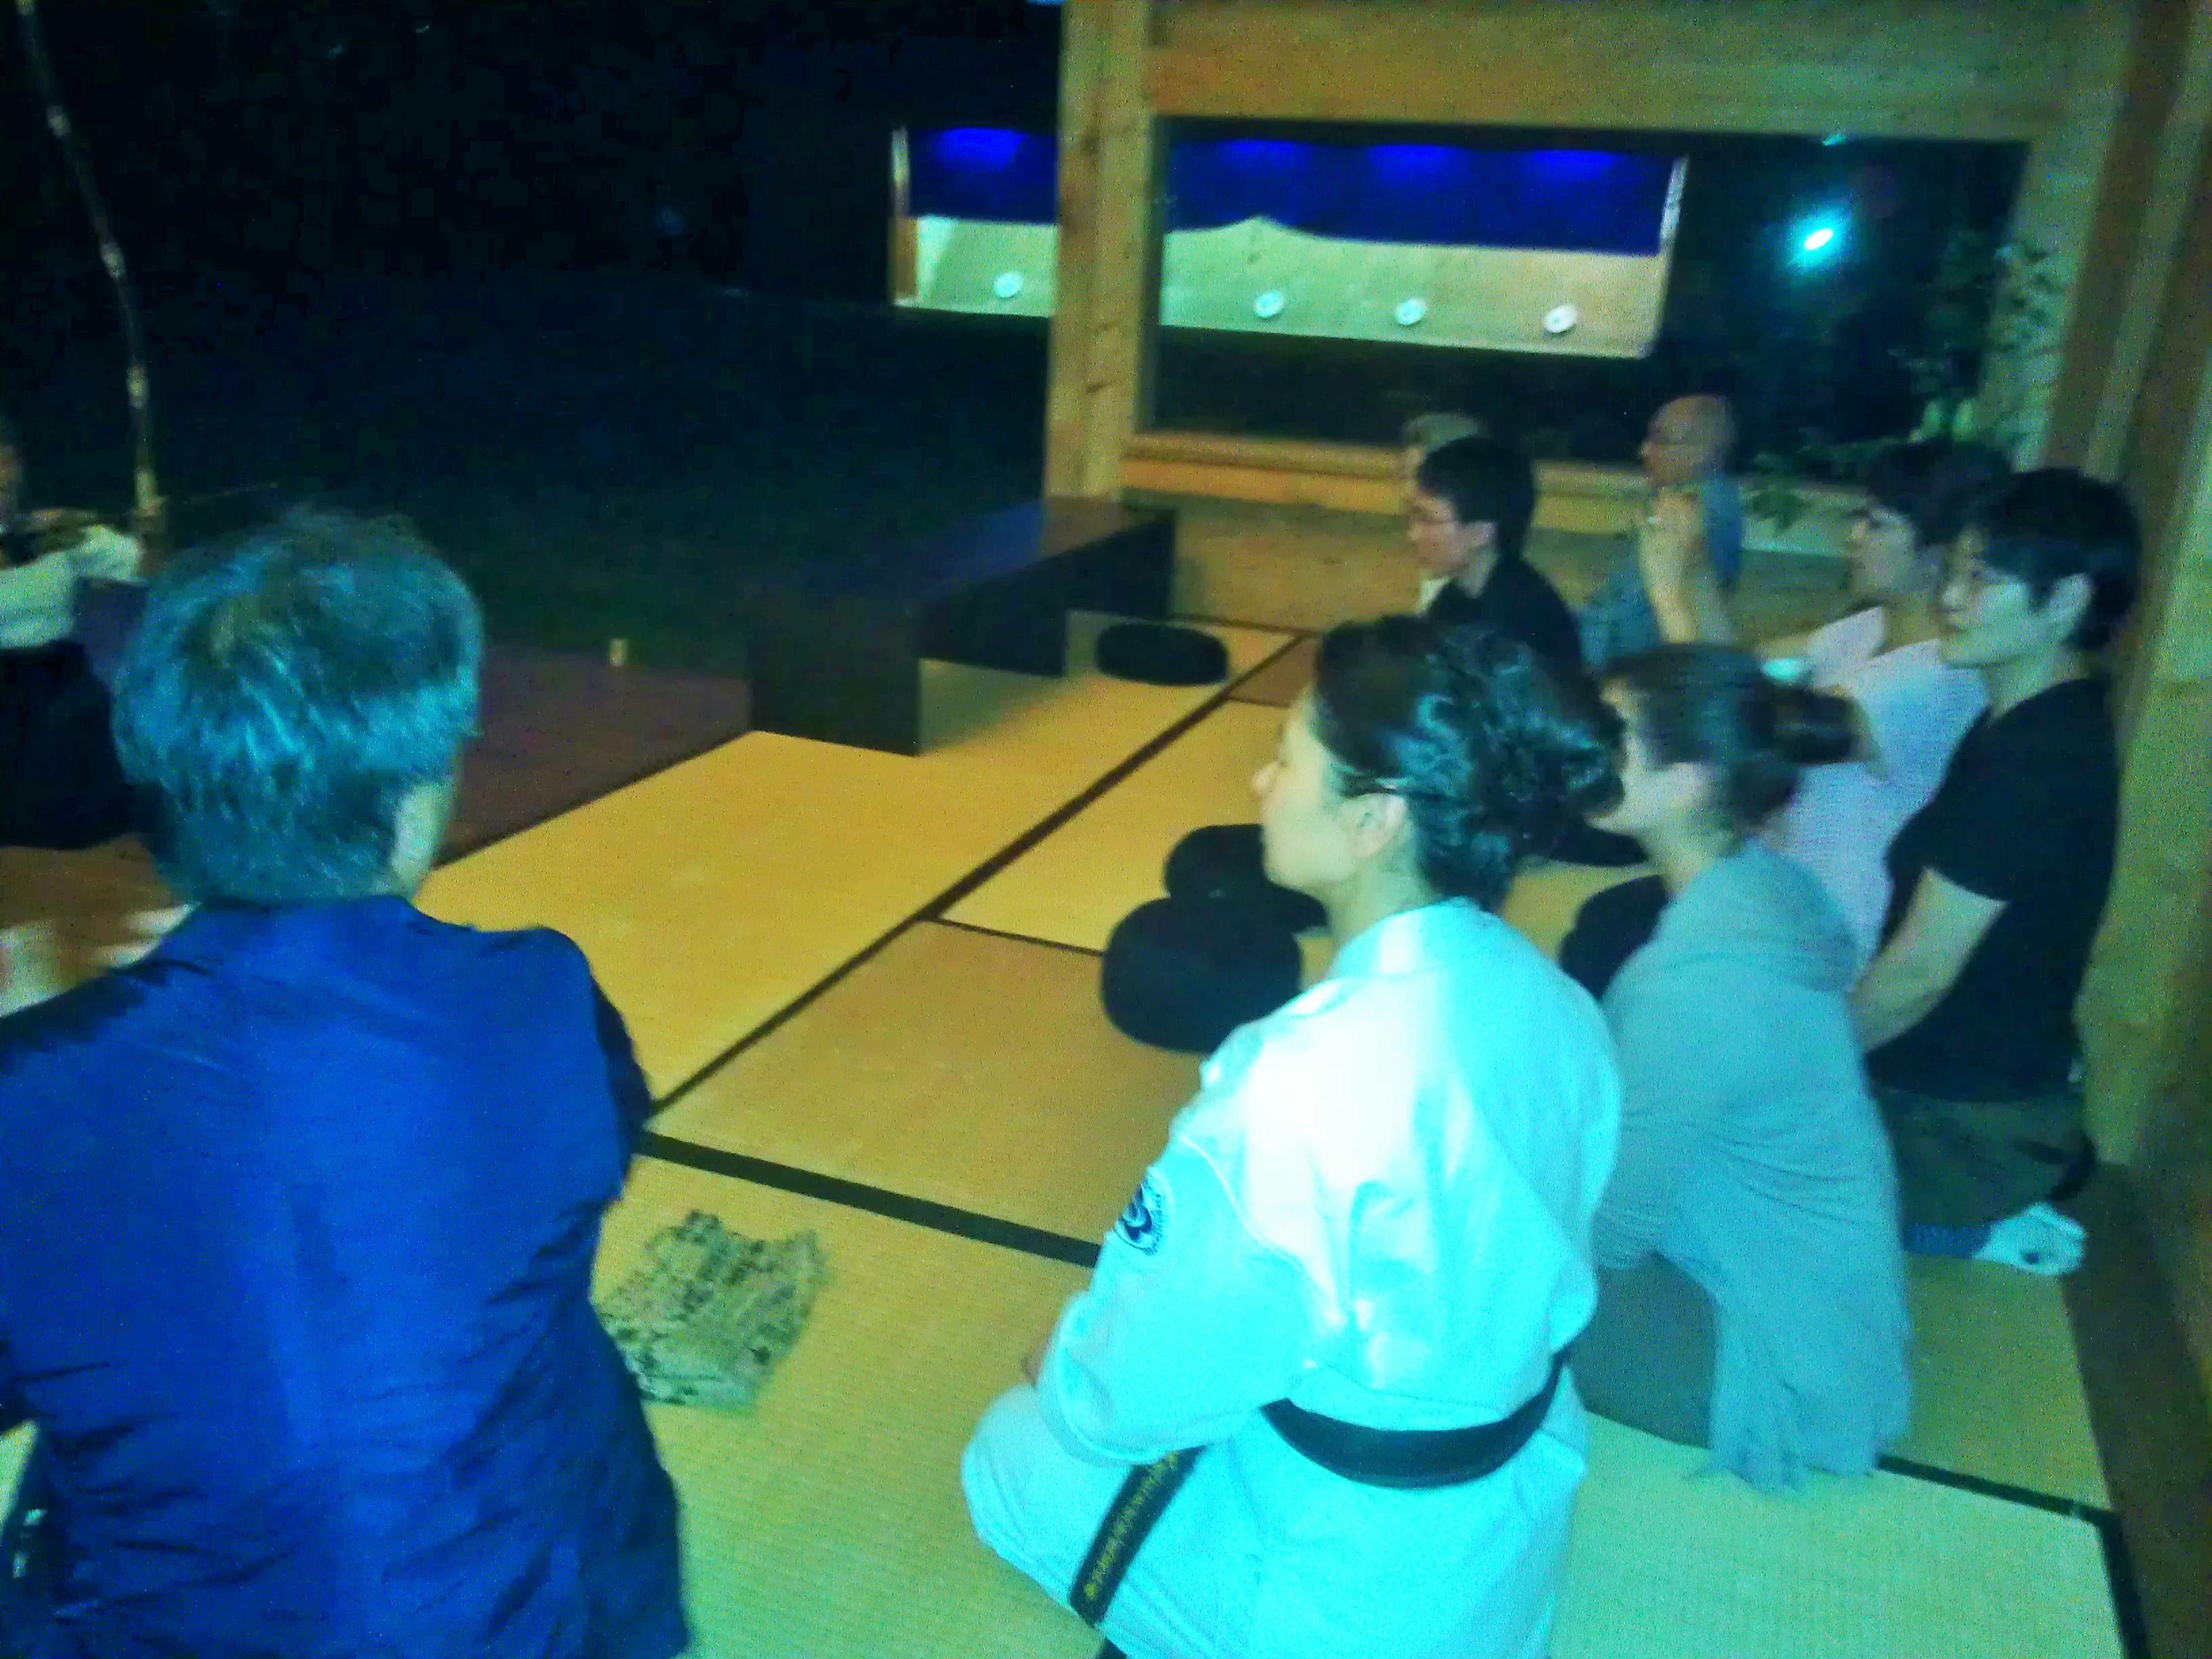 04.06.2015, Seminar Shibata XXI, japanischer Abend, WP_001369